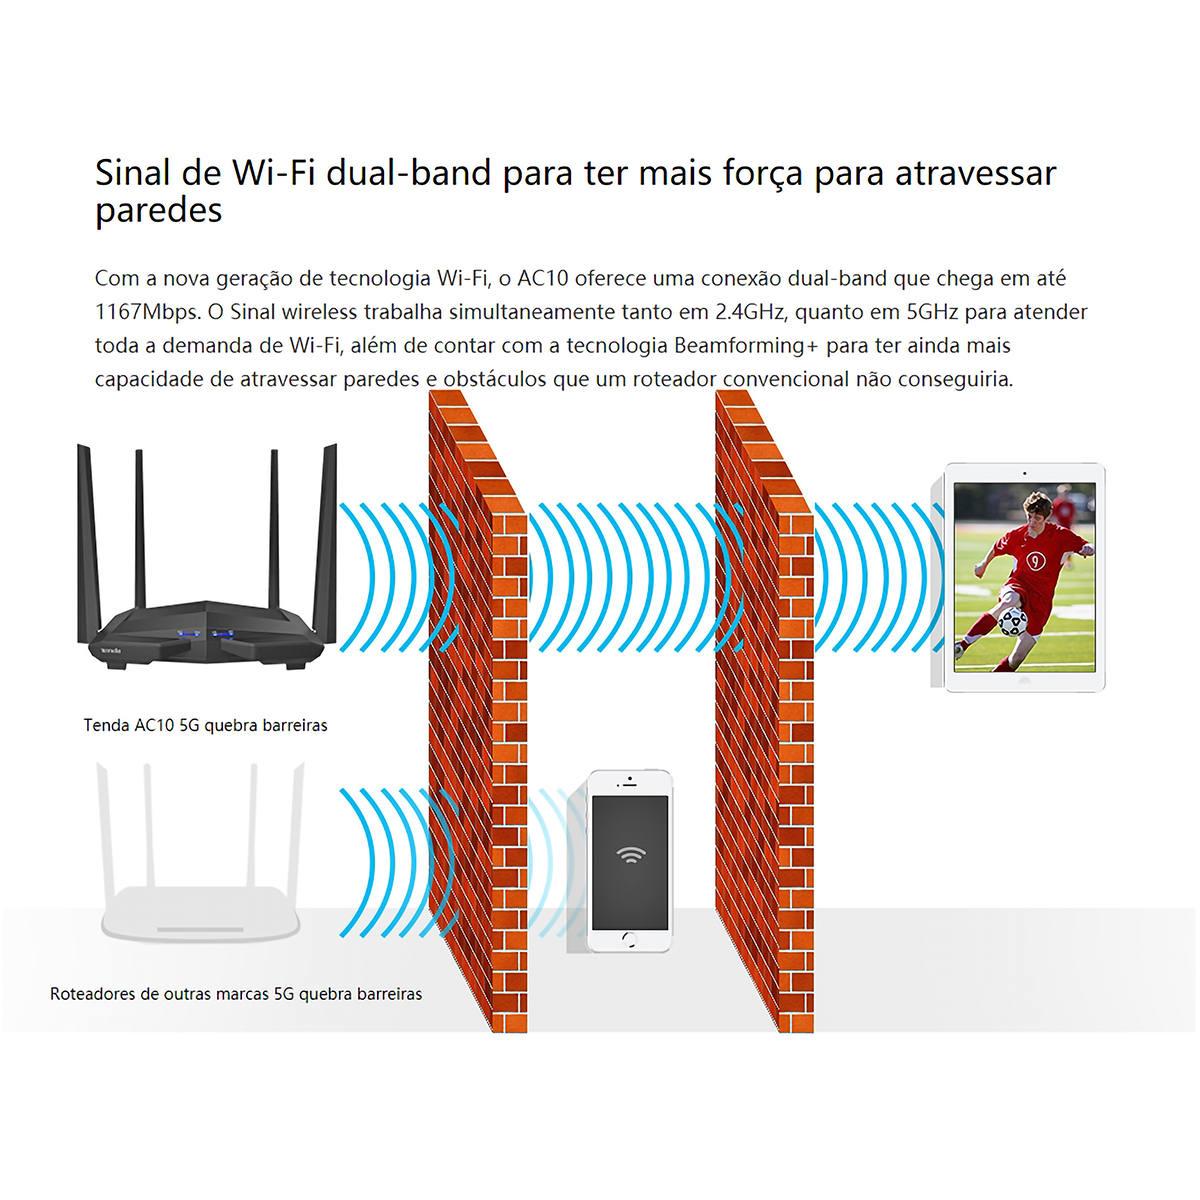 Roteador Gigabit Wireless AC1200 Smart Dual Band 4 Antenas 1200Mpbs MU-MIMO Beamforming+ 4 Portas Tenda WIFI AC10